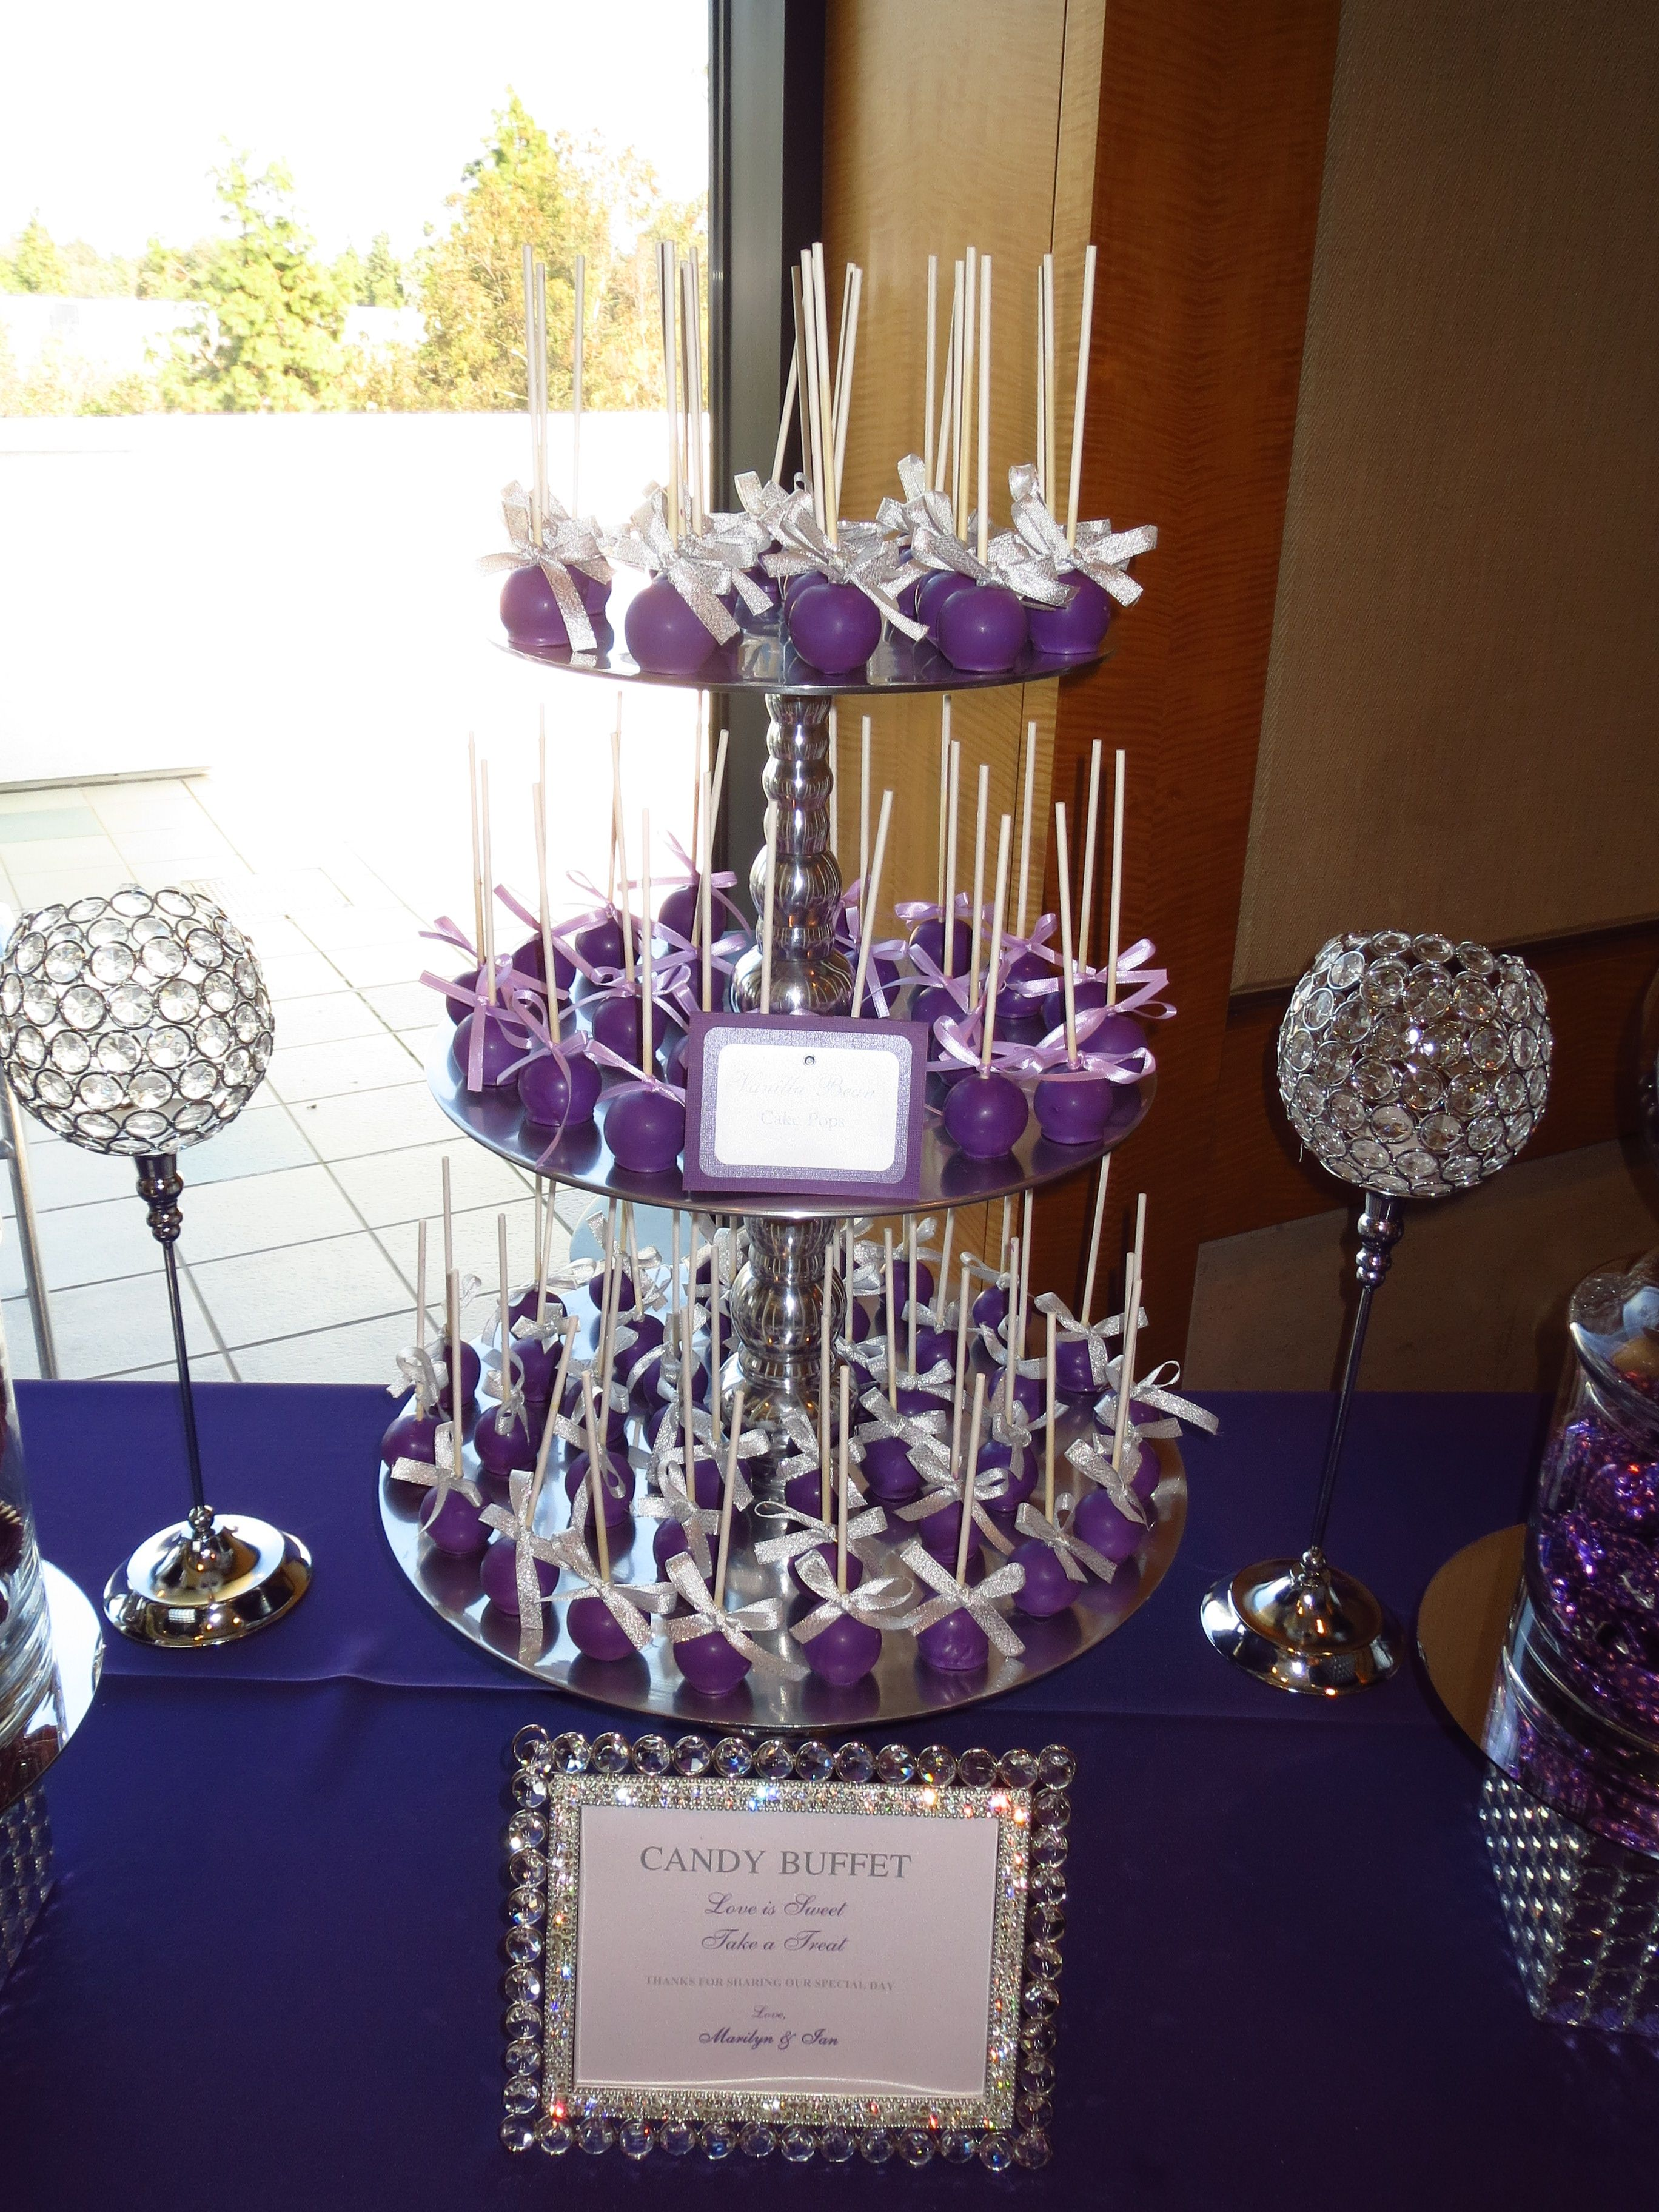 Pin By Oc Sugar Mama On Purple Candy Dessert Table Purple Candy Buffet Wedding Candy Buffet Table Wedding Purple Candy Table